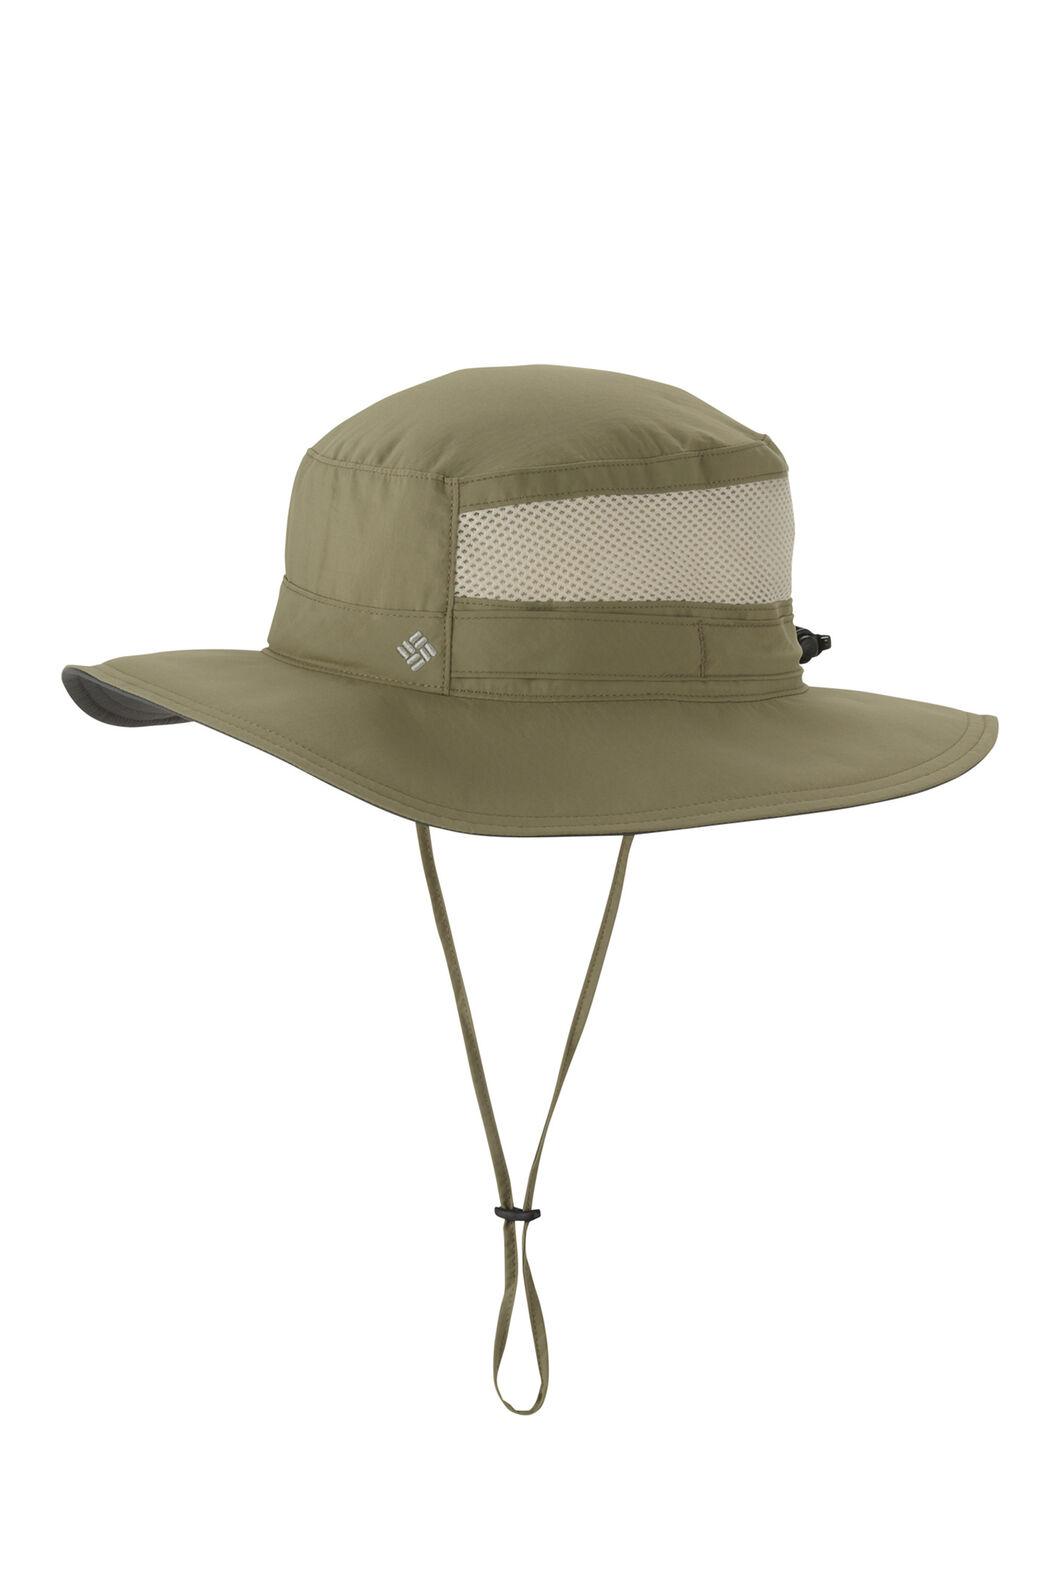 Columbia Men's Bora Bora II Hat One Size Fits Most, COLLEGIATE NAVY, hi-res